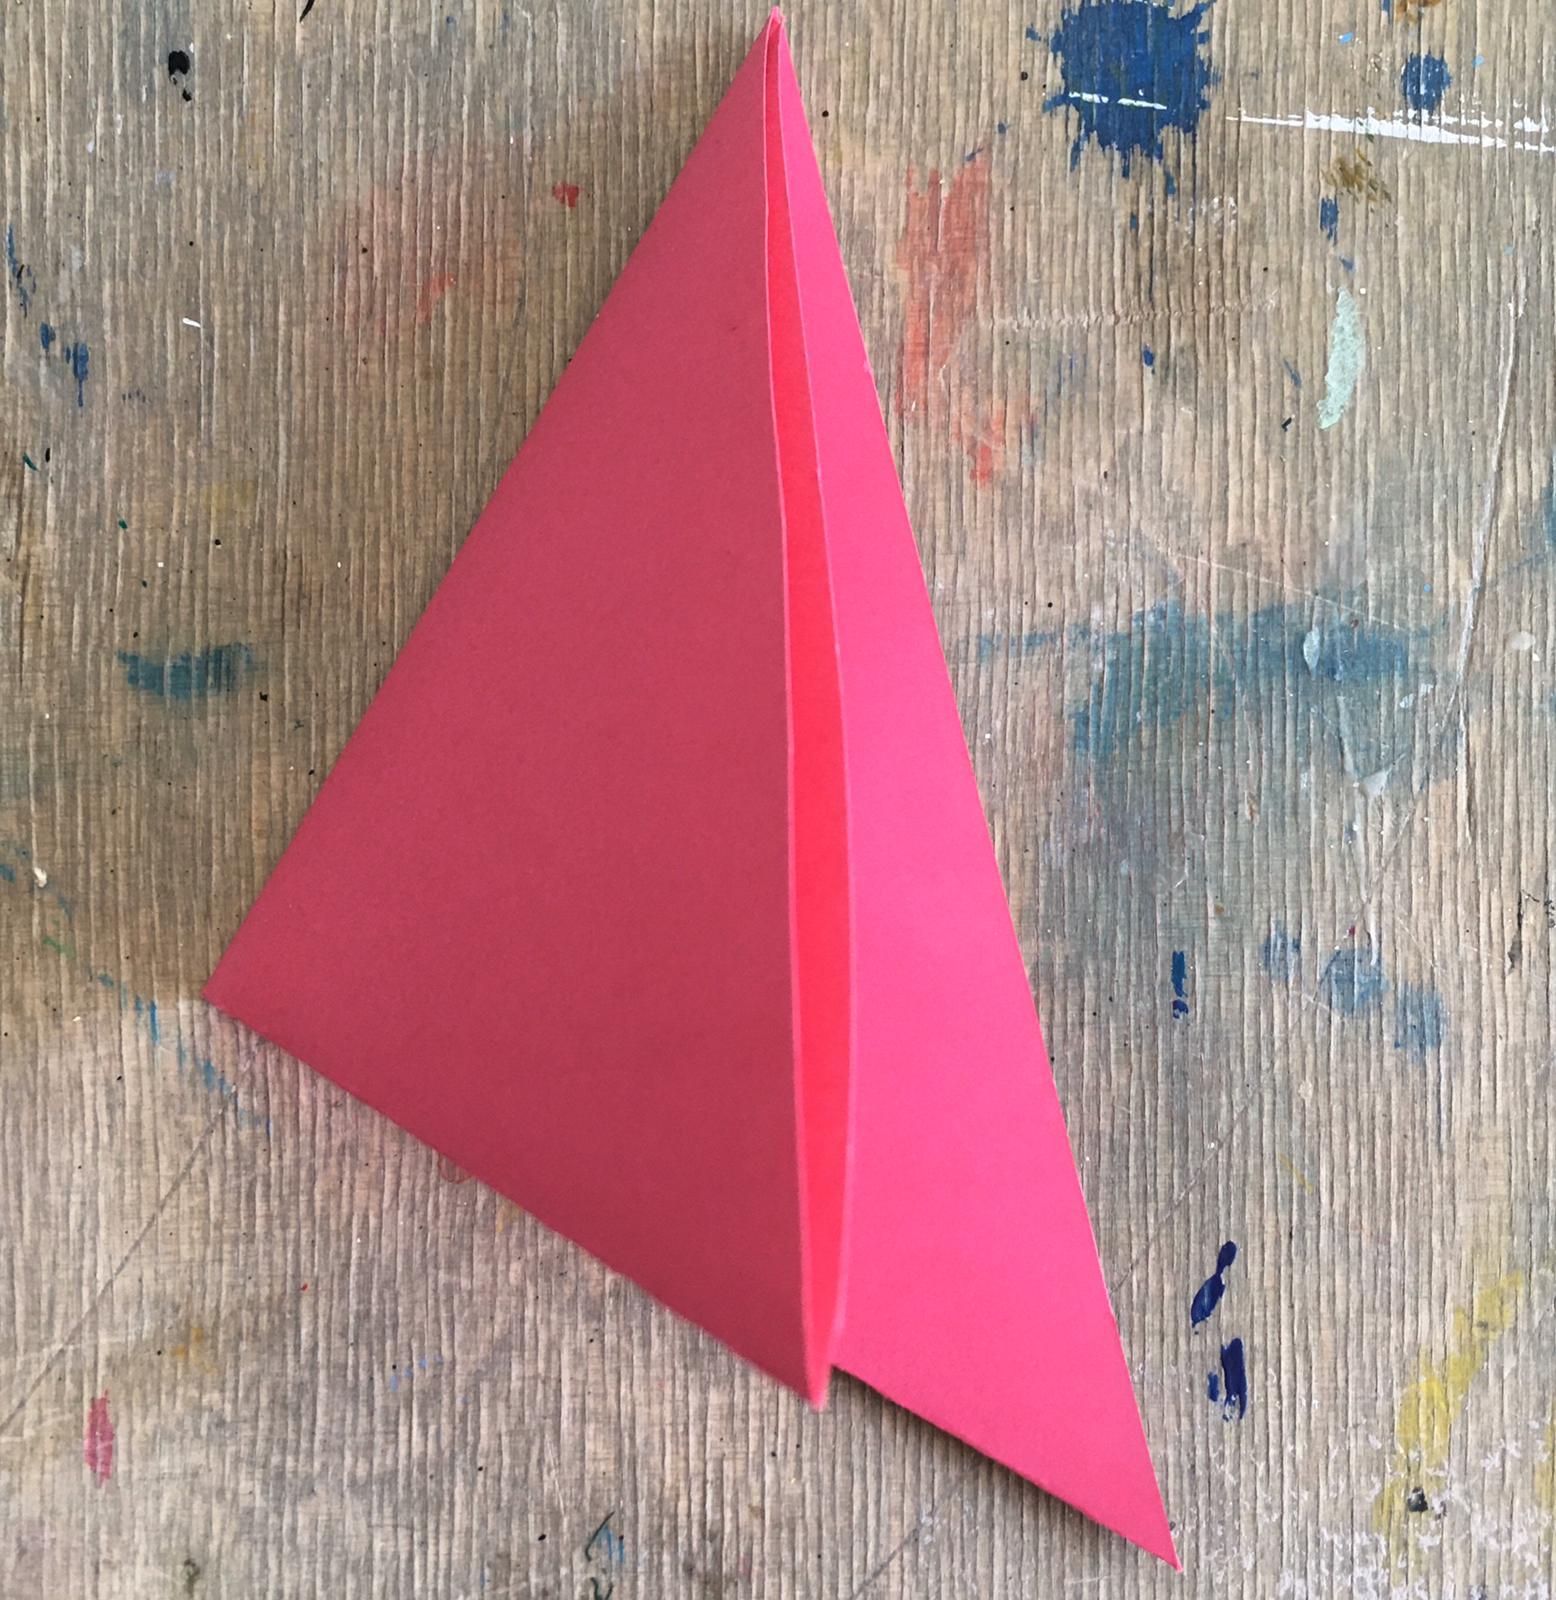 Papier zum Dreieck gefaltet